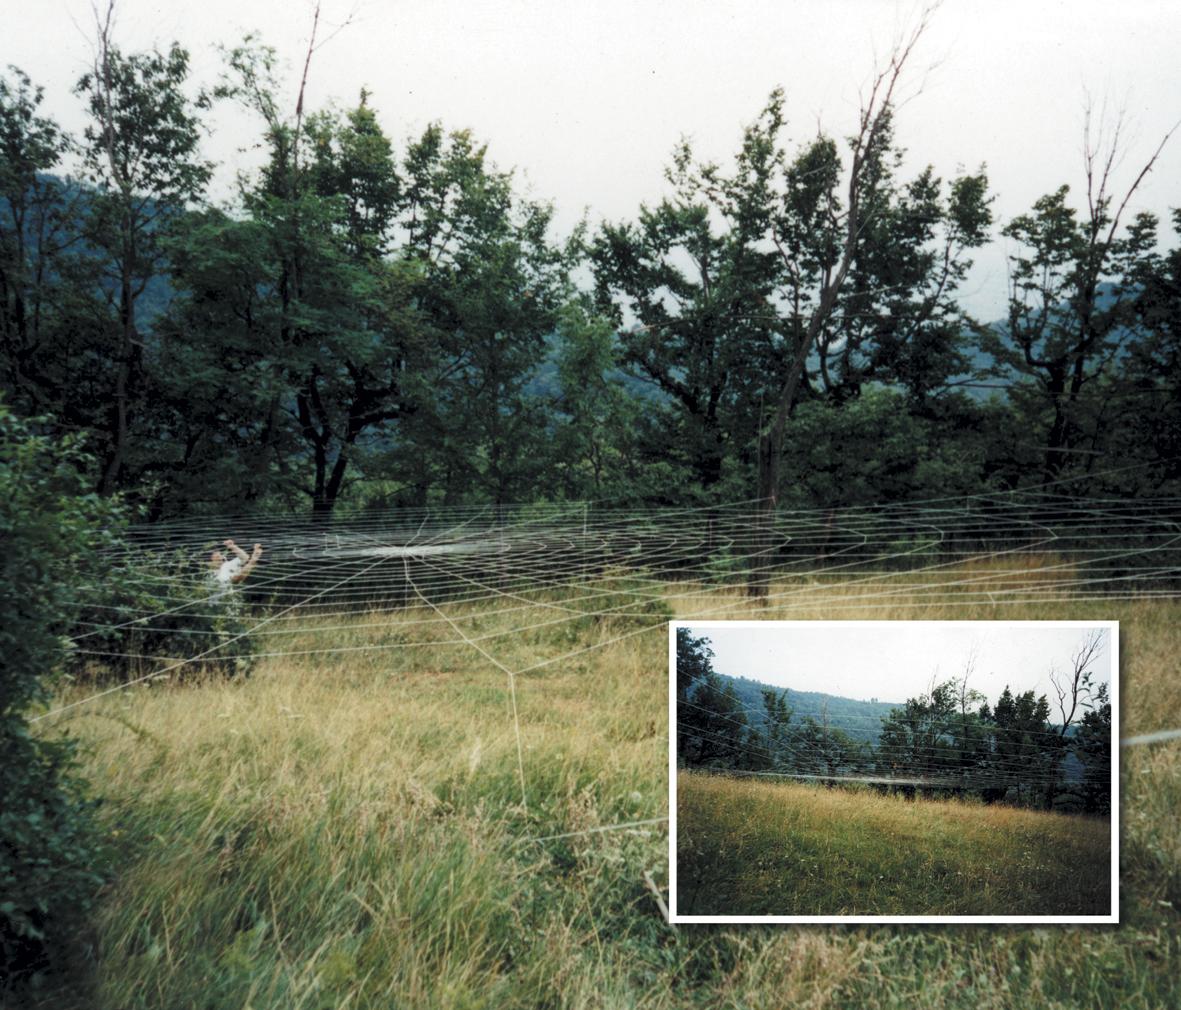 Ragnatela umana monte Maddalena Brescia 1993